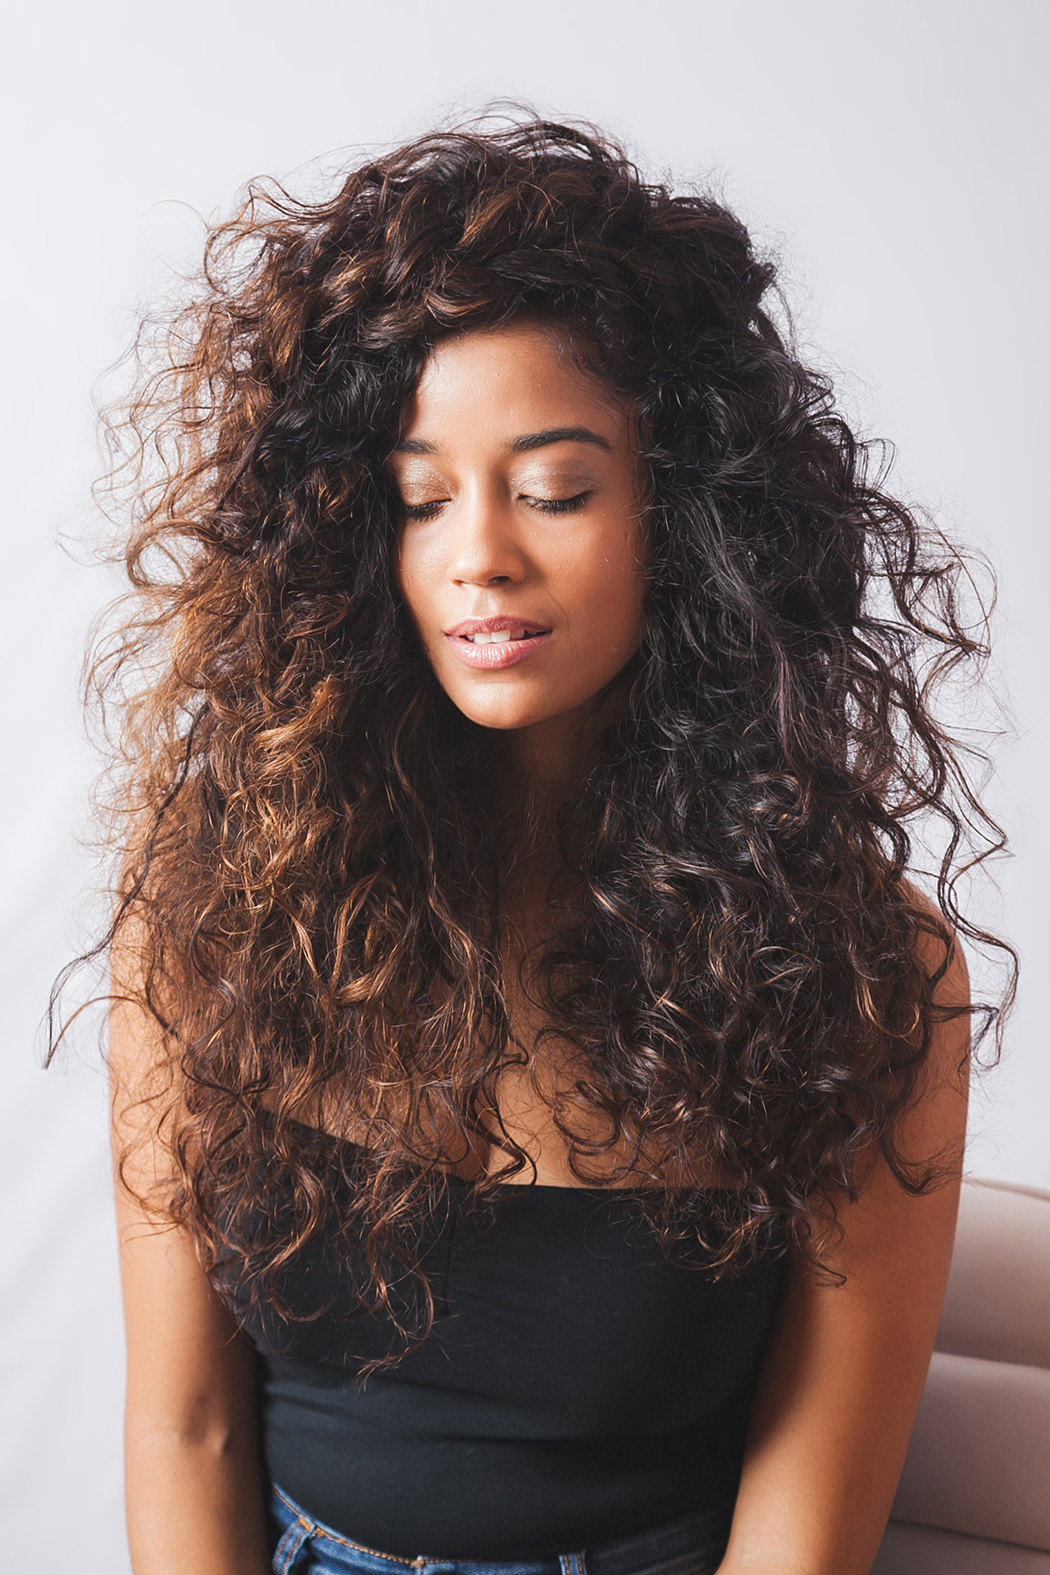 Photography Jennifer Coffey, Model Lindsey Gonzalez, Hair Maritza Buelvas for Xtava.com